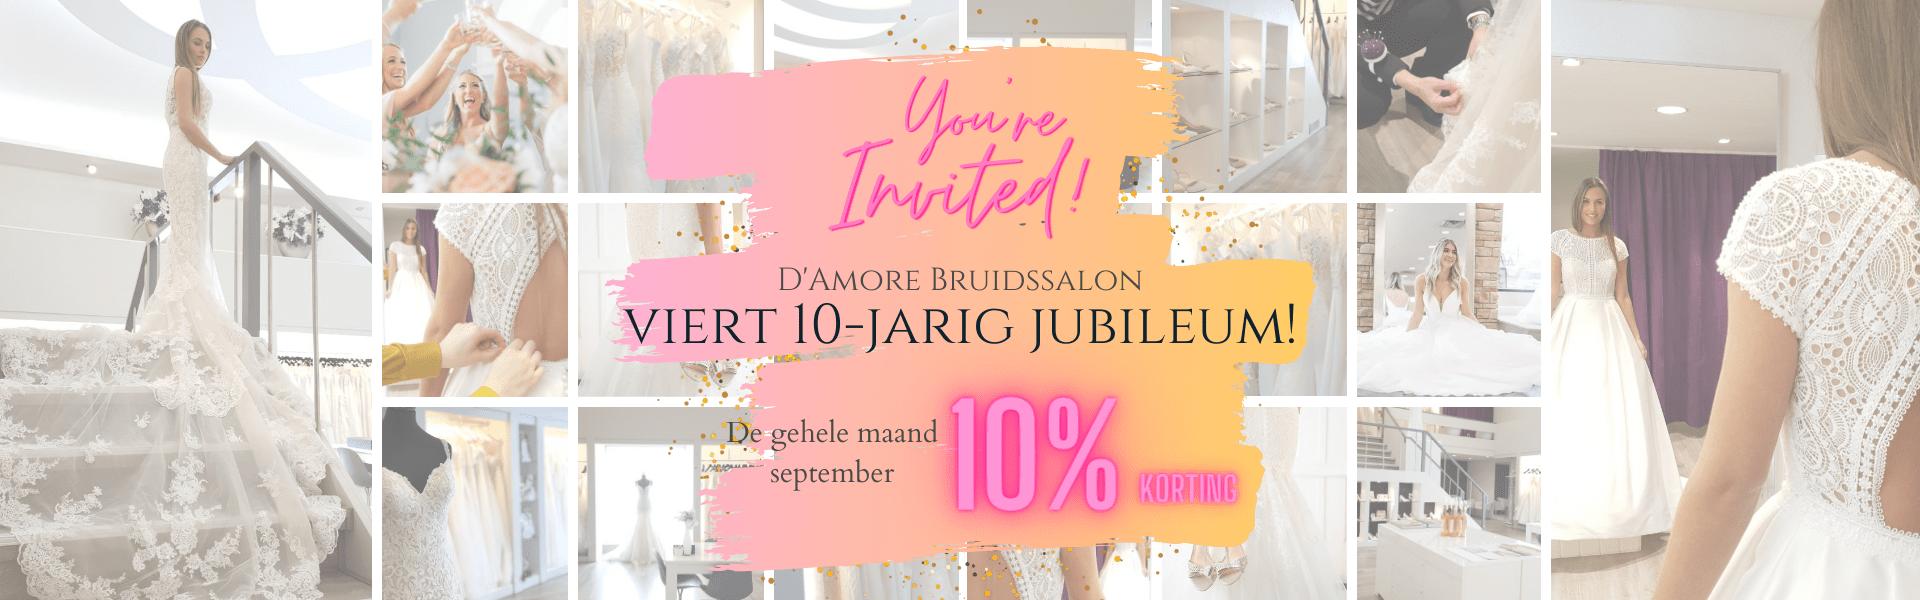 jubileum banner 10